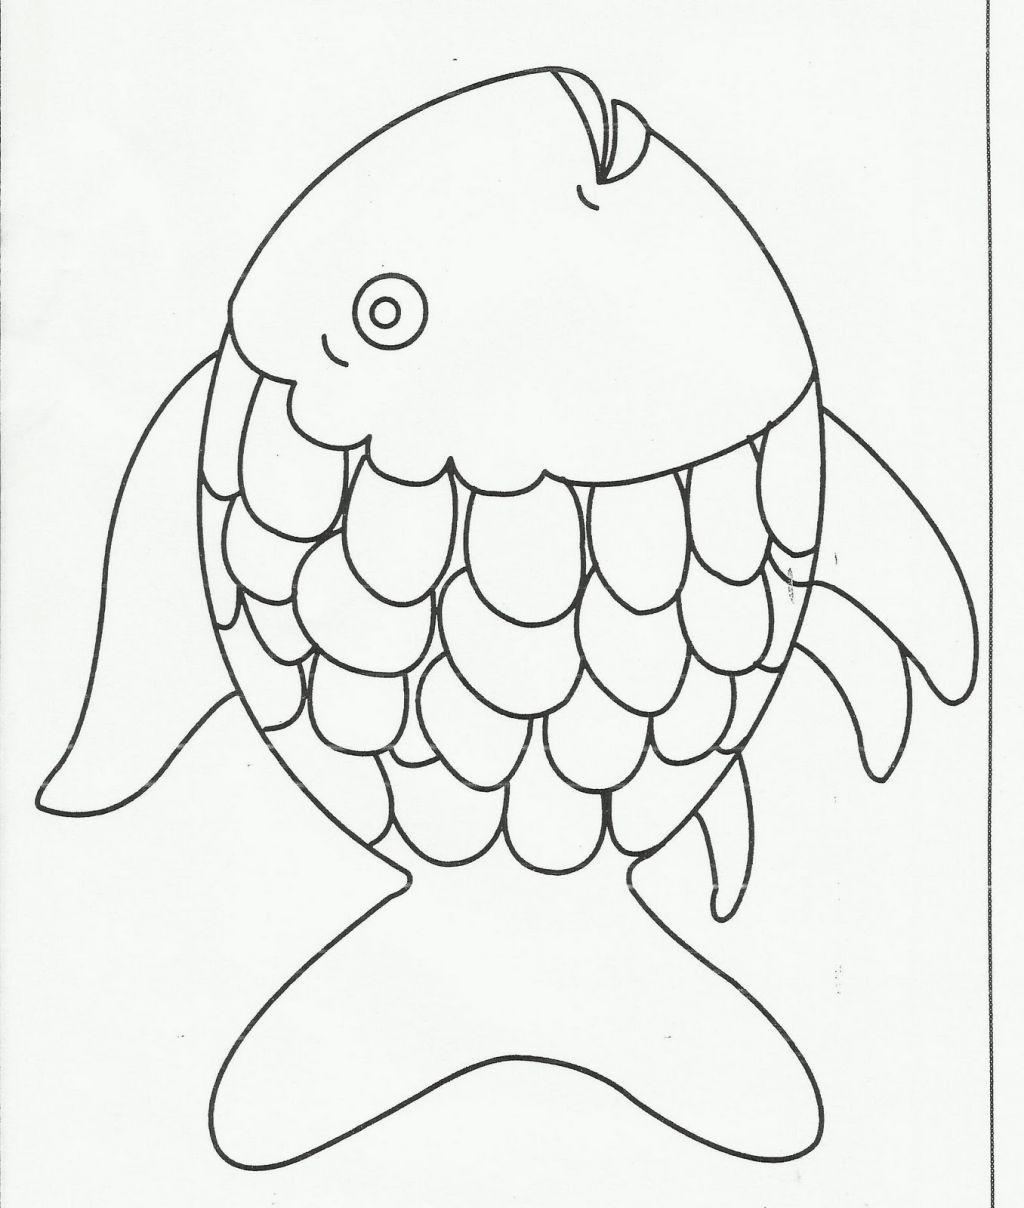 Rainbow Fish Coloring Sheet Coloring Pages Rainbow Fish Template Rainbow Fish Coloring Page Rainbow Fish